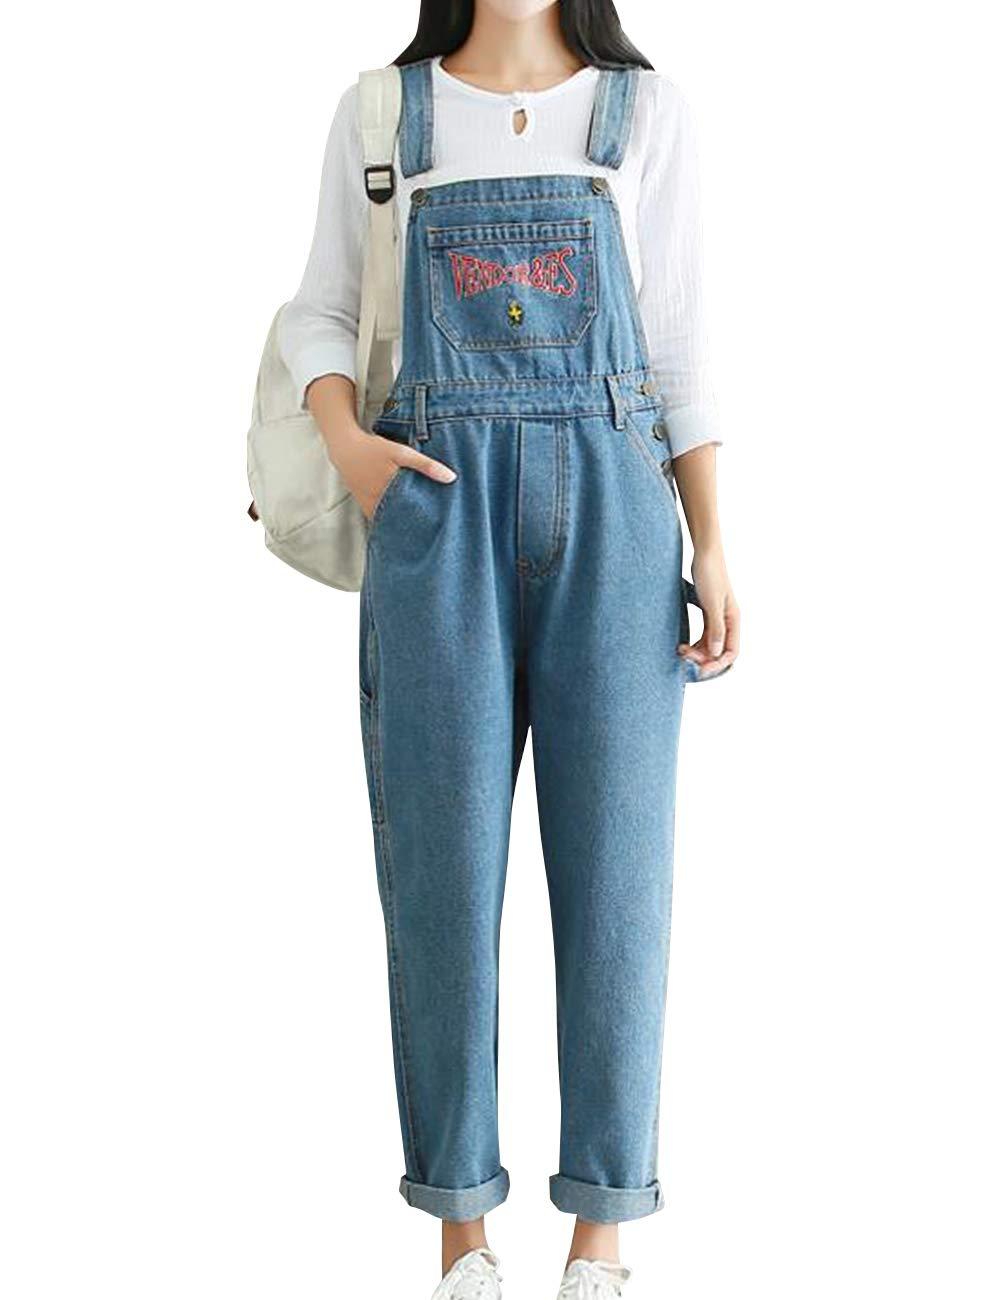 SUGIRLS Women's Casual Vintage Embroidery Bib Overalls Wide Leg Cropped Harem Denim Jumpsuit Pants Light Blue XL